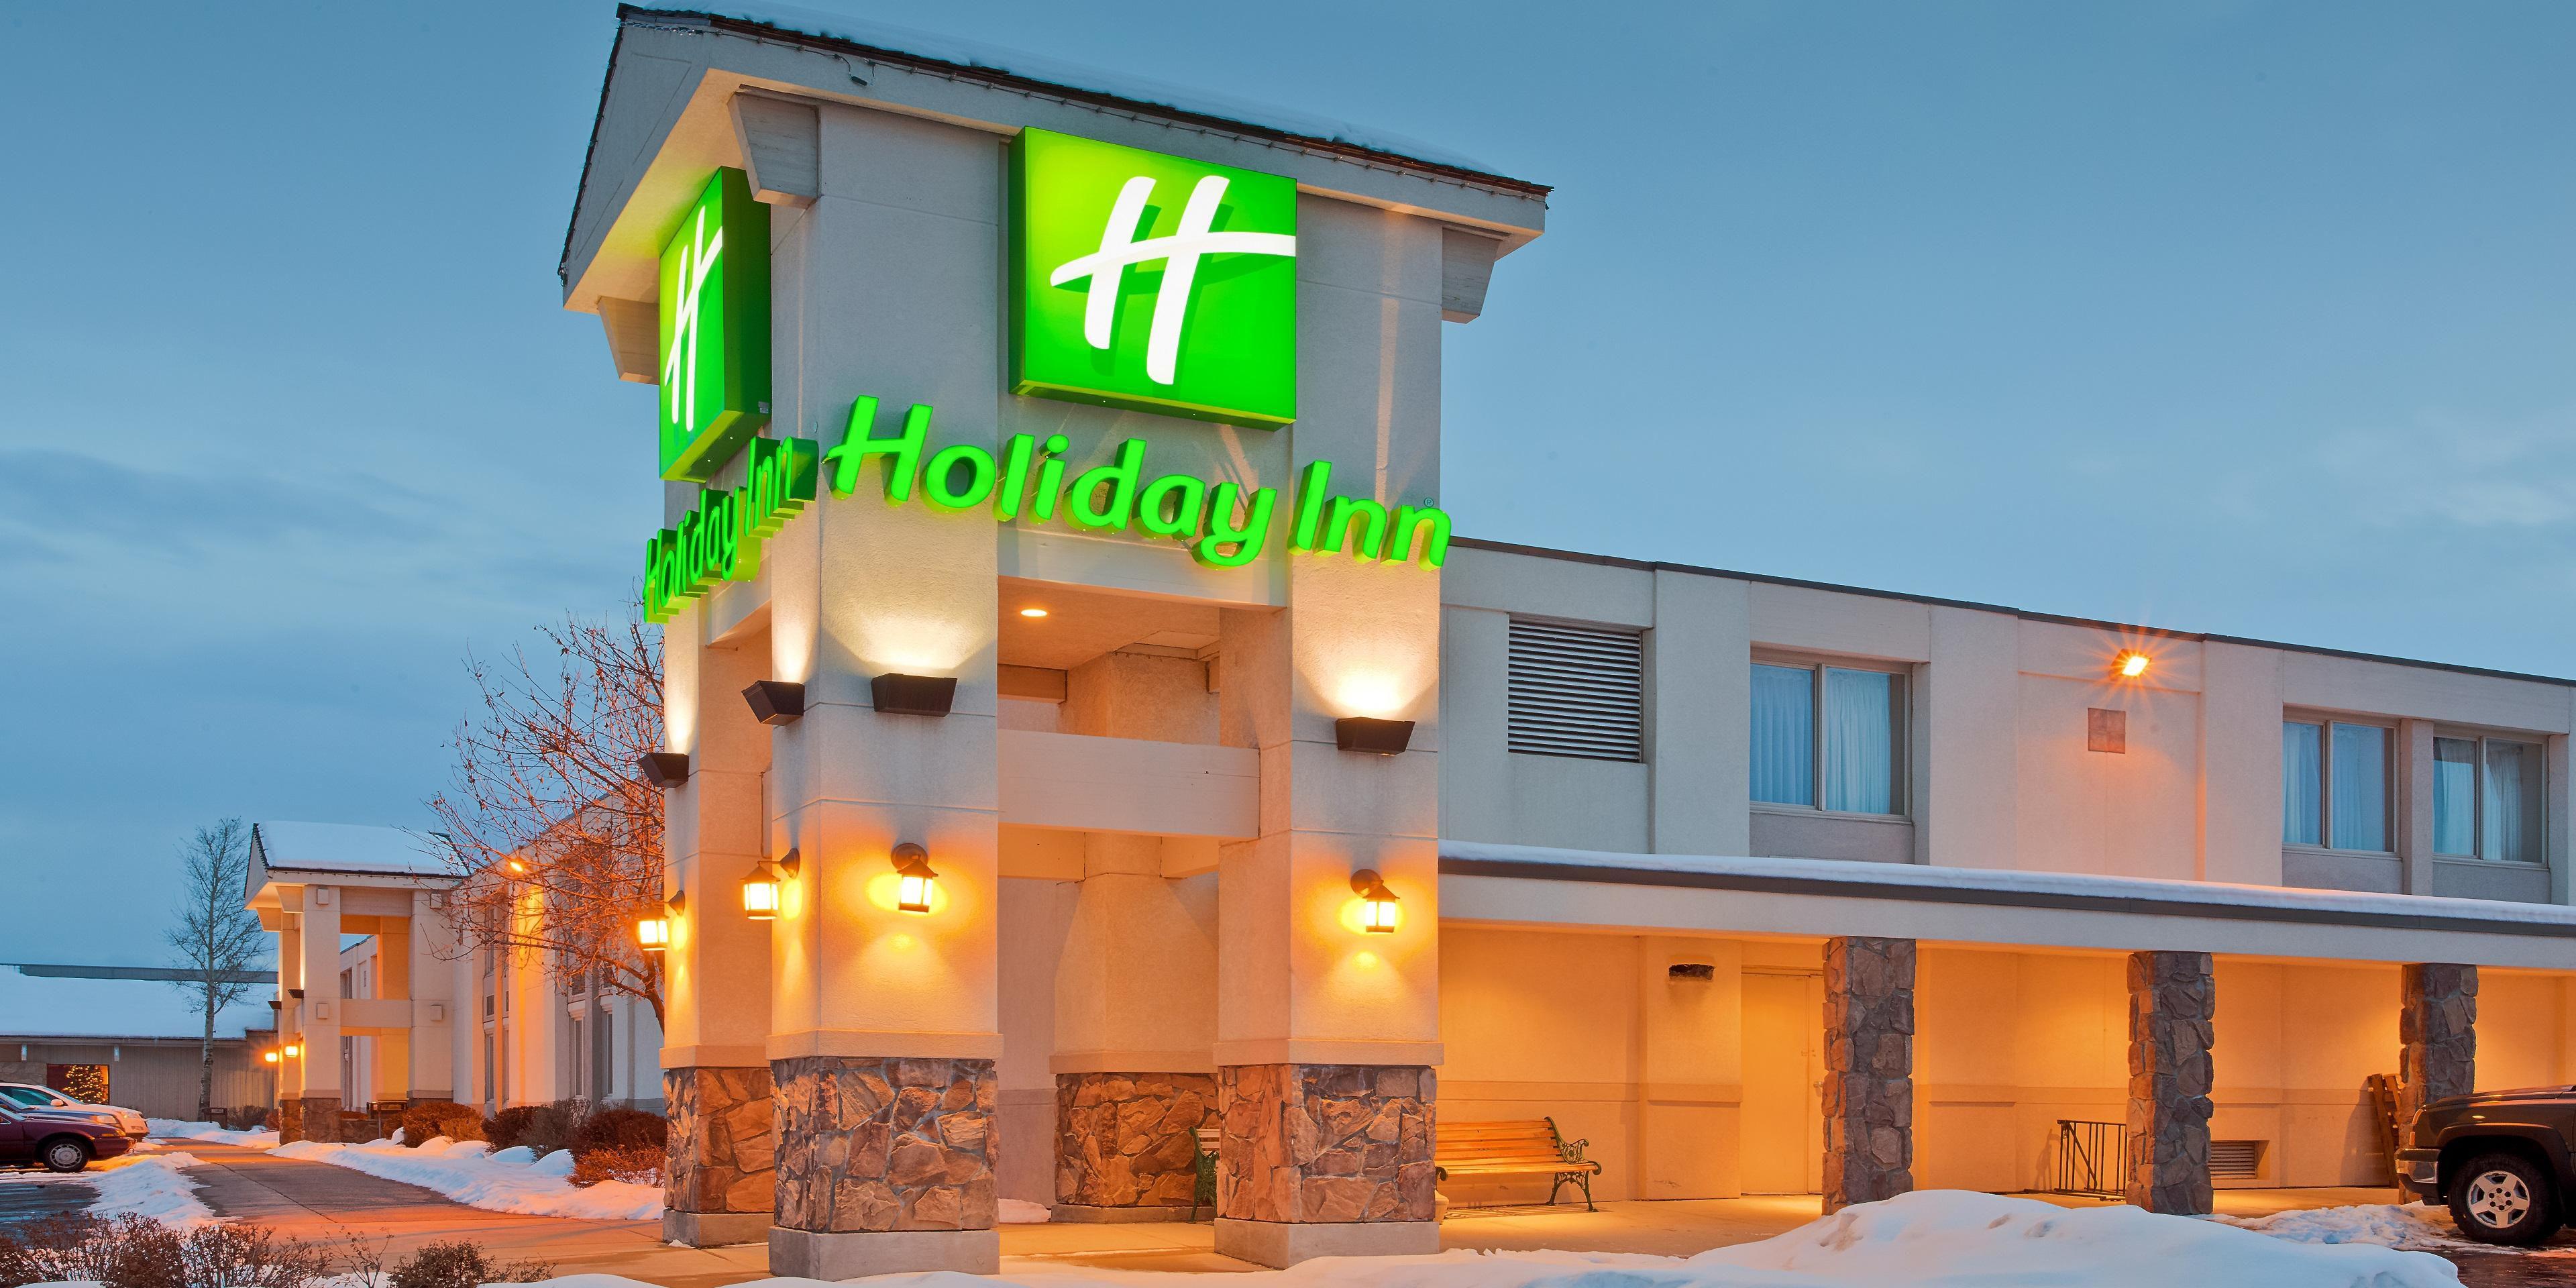 Hotels close to msu bozeman